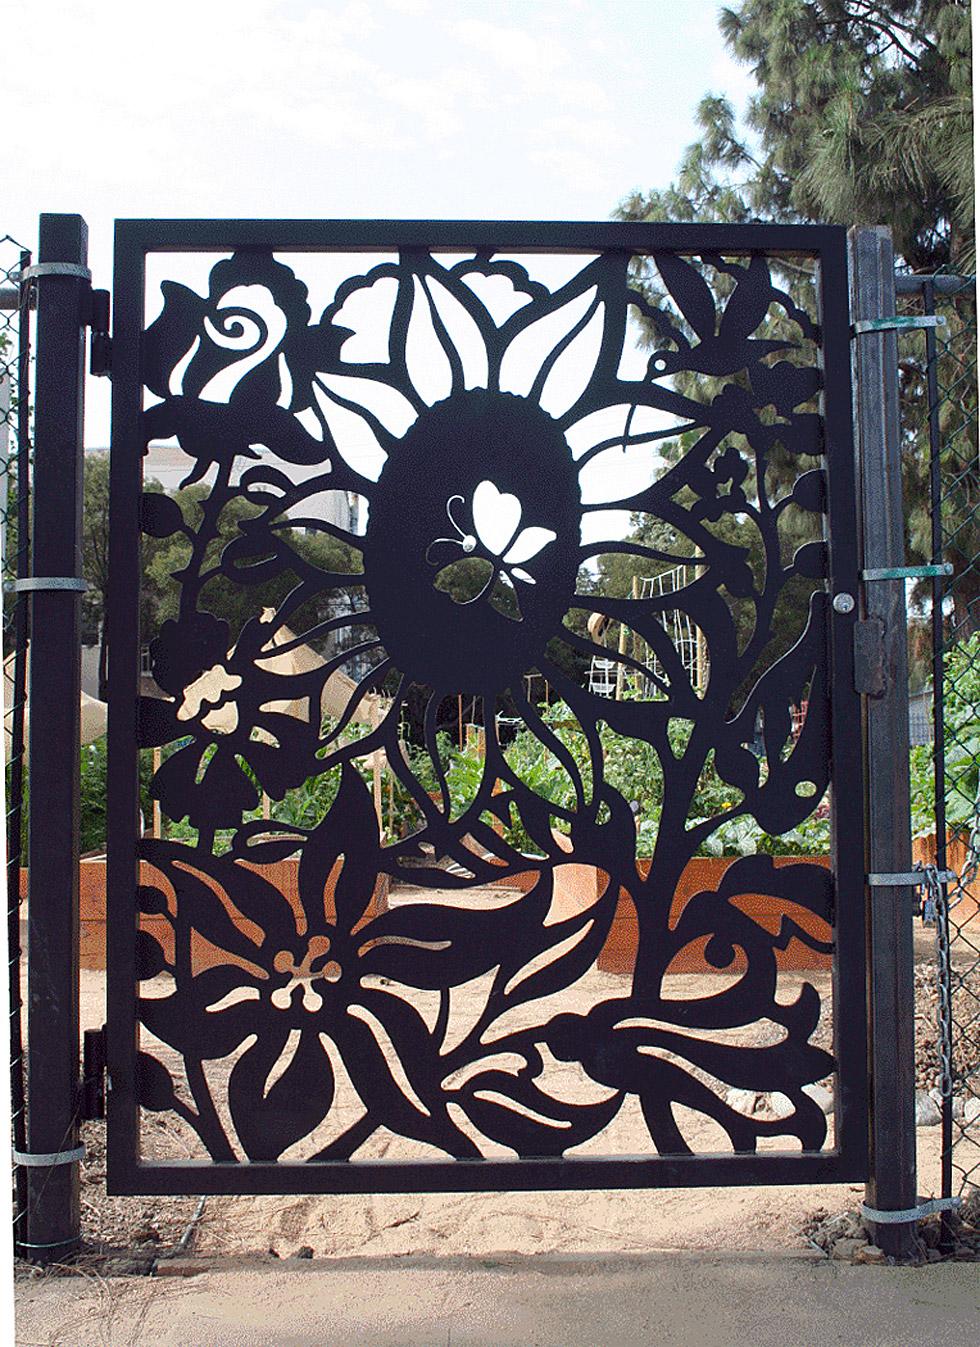 alferov-media-los-angeles-fountain-community-gardens-michael-amasecua-garden-gate